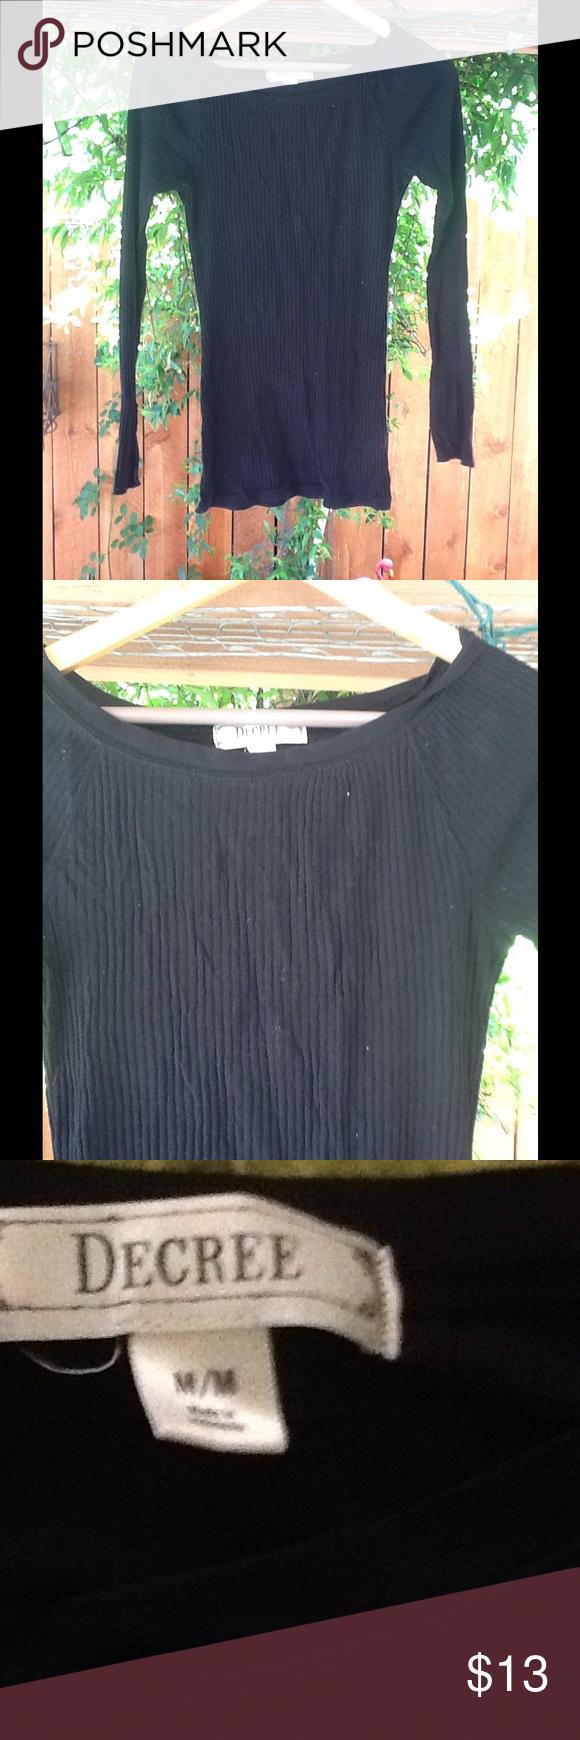 Long sleeve black sweater size Medium Well worn black sweater size medium. (14) Decree Sweaters